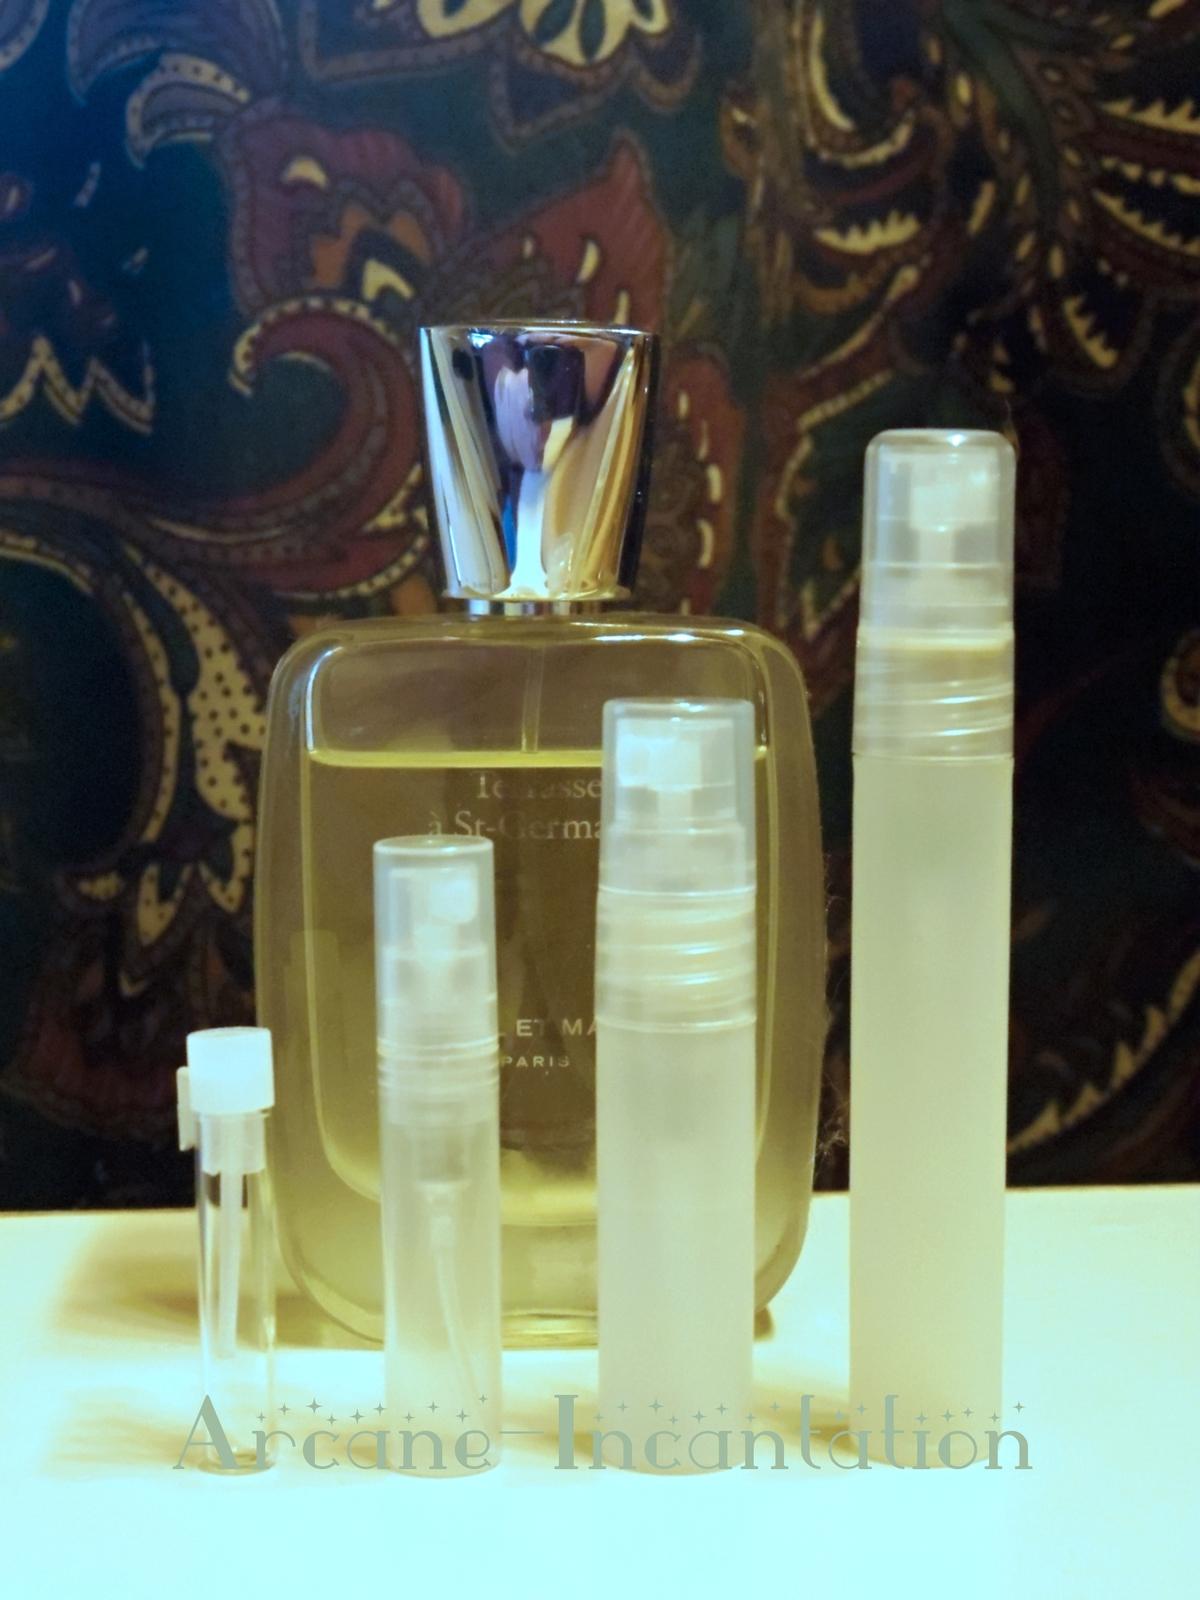 Image 0 of Jul et Mad Terrasse a St-Germain Parfum Extrait Samples